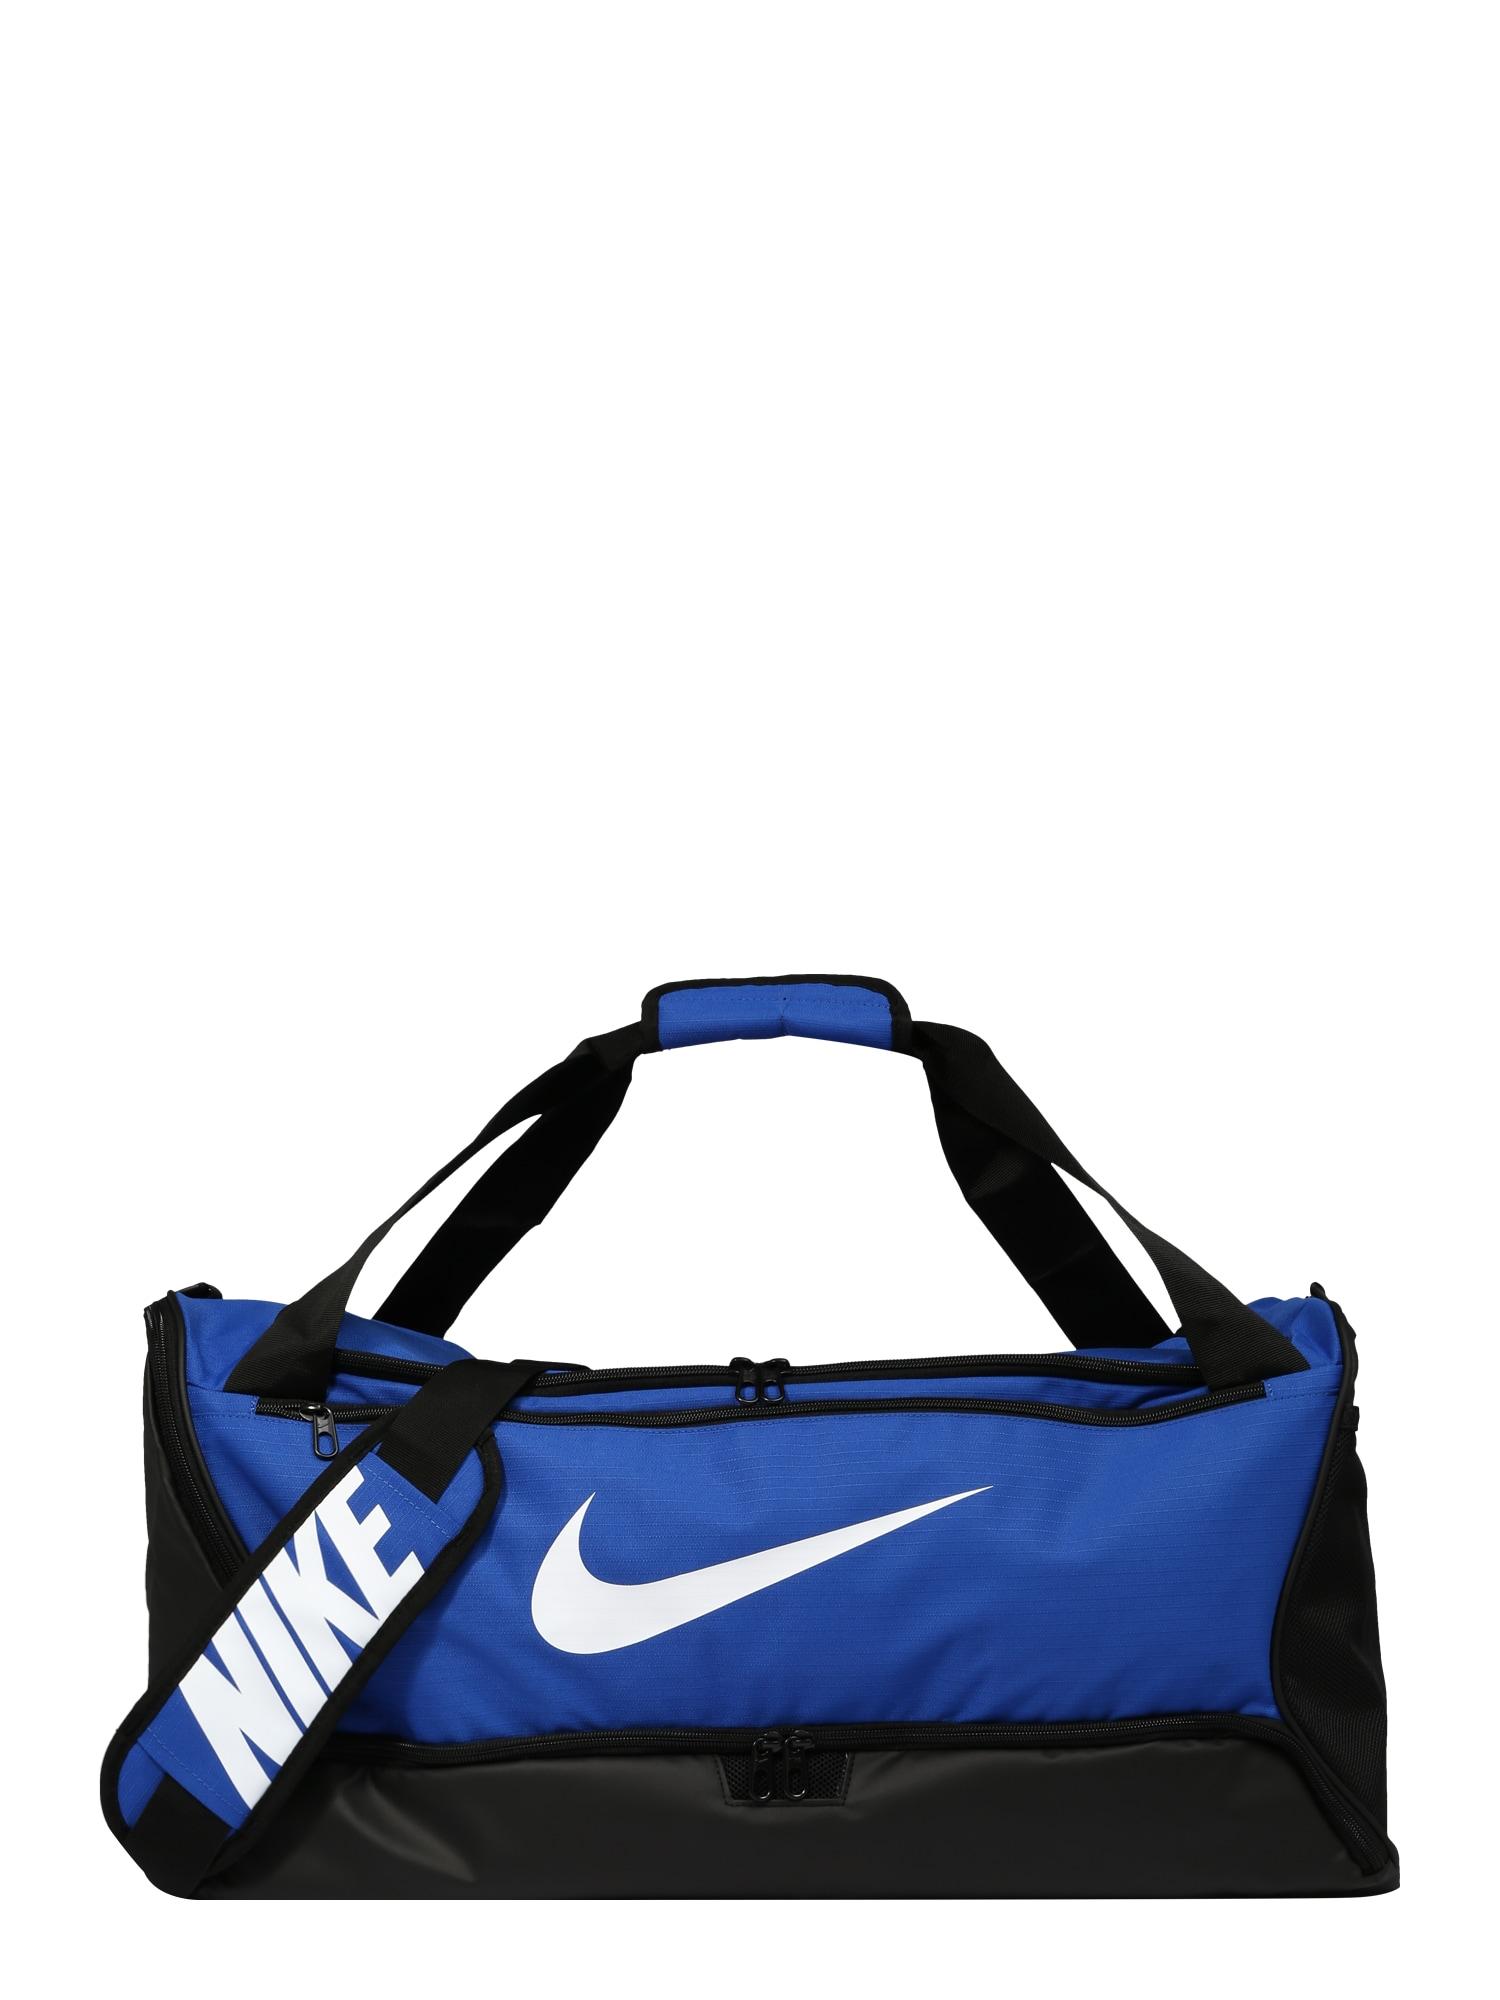 "NIKE Sportinis krepšys sodri mėlyna (""karališka"") / juoda / balta"